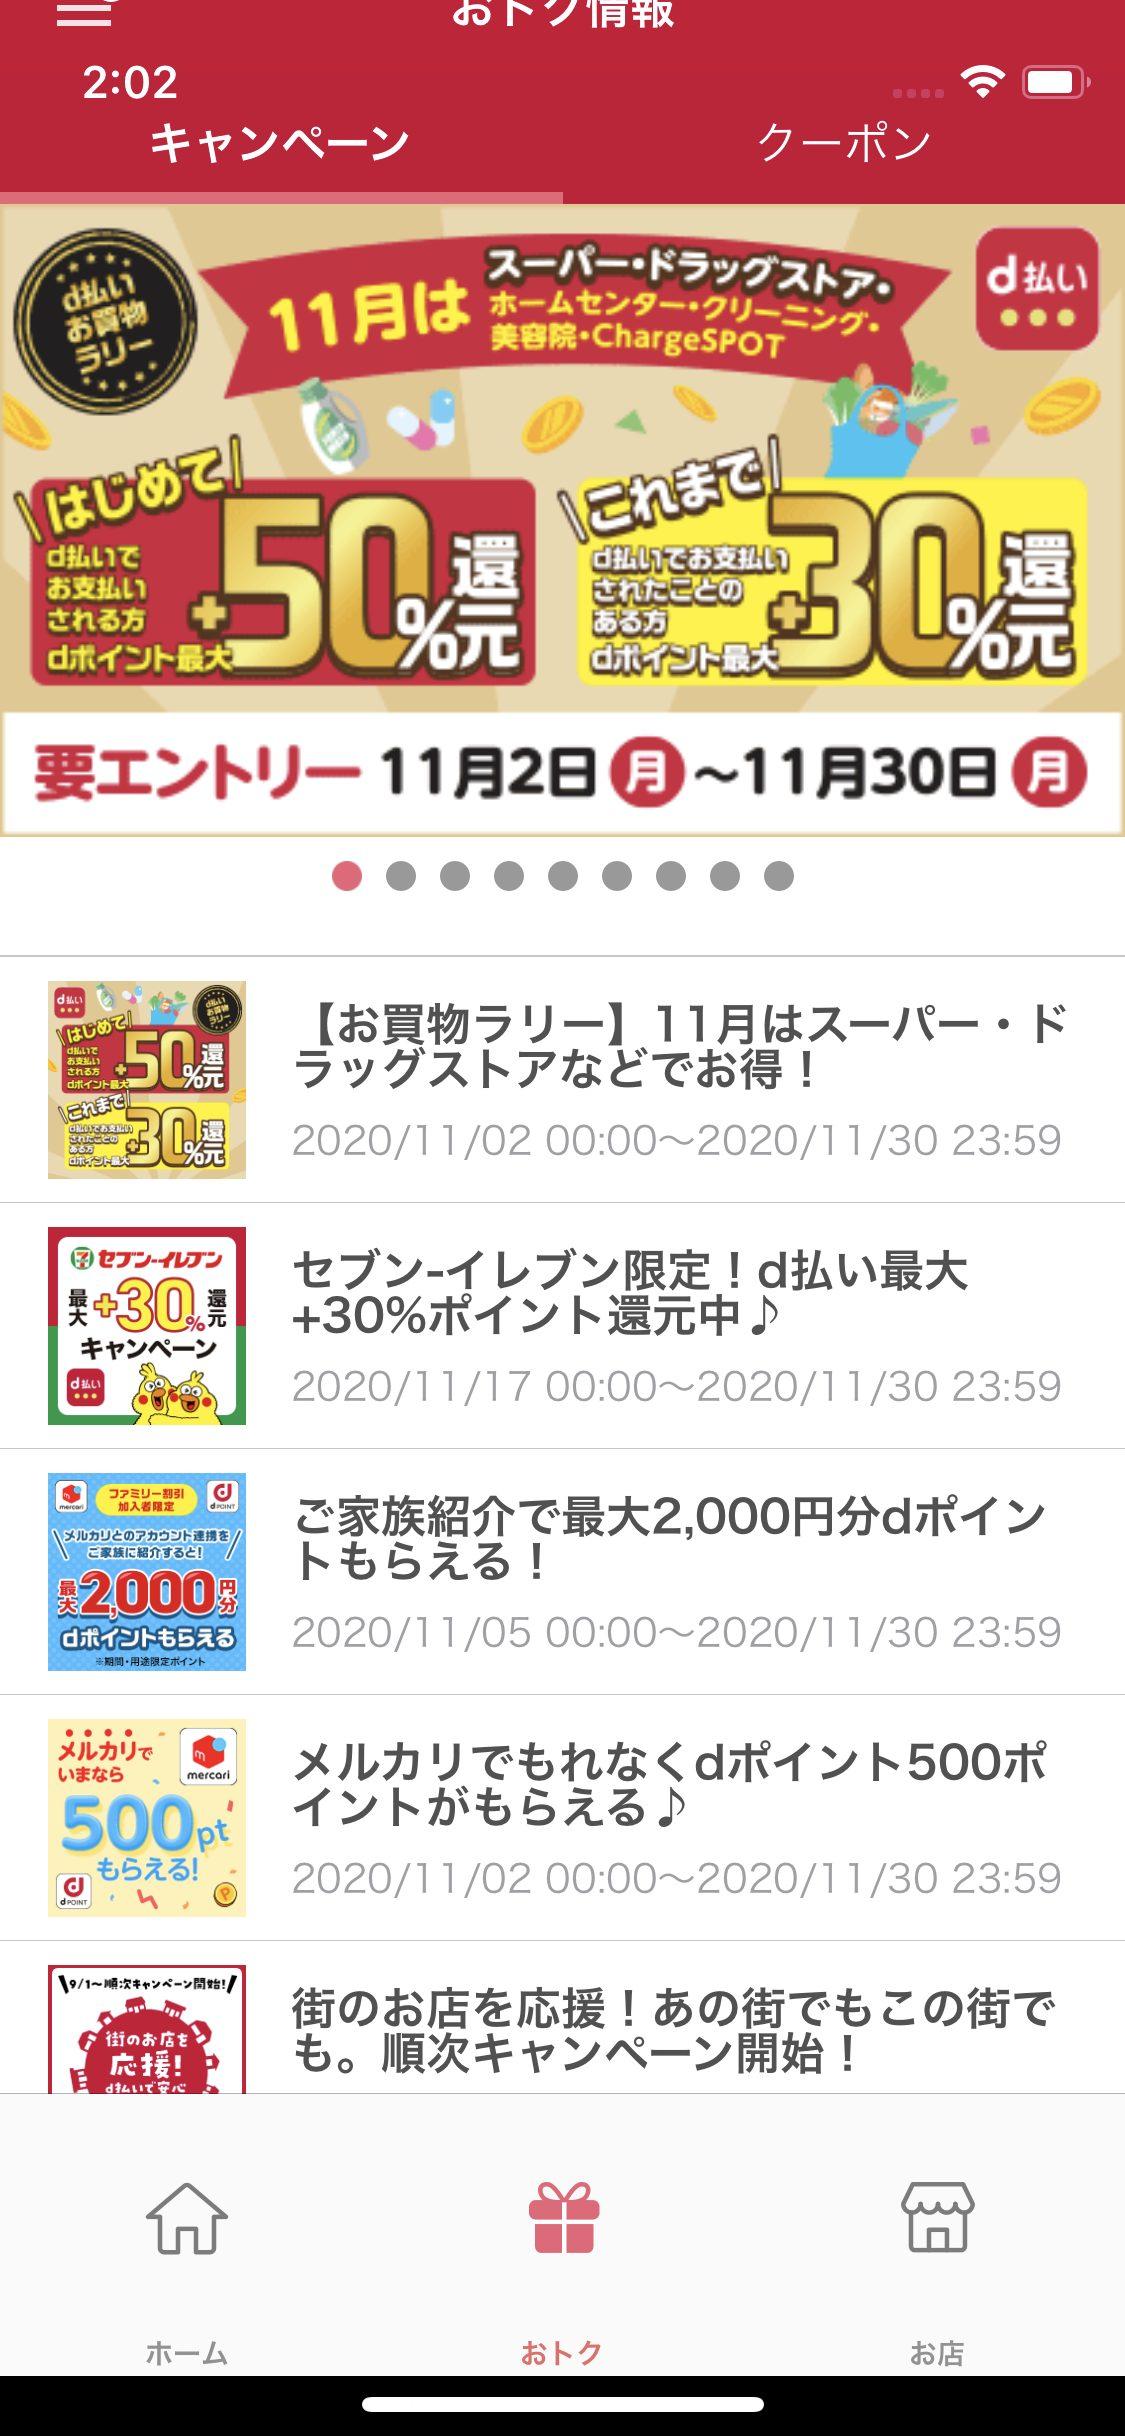 iPhone 12 mini d払いアプリ